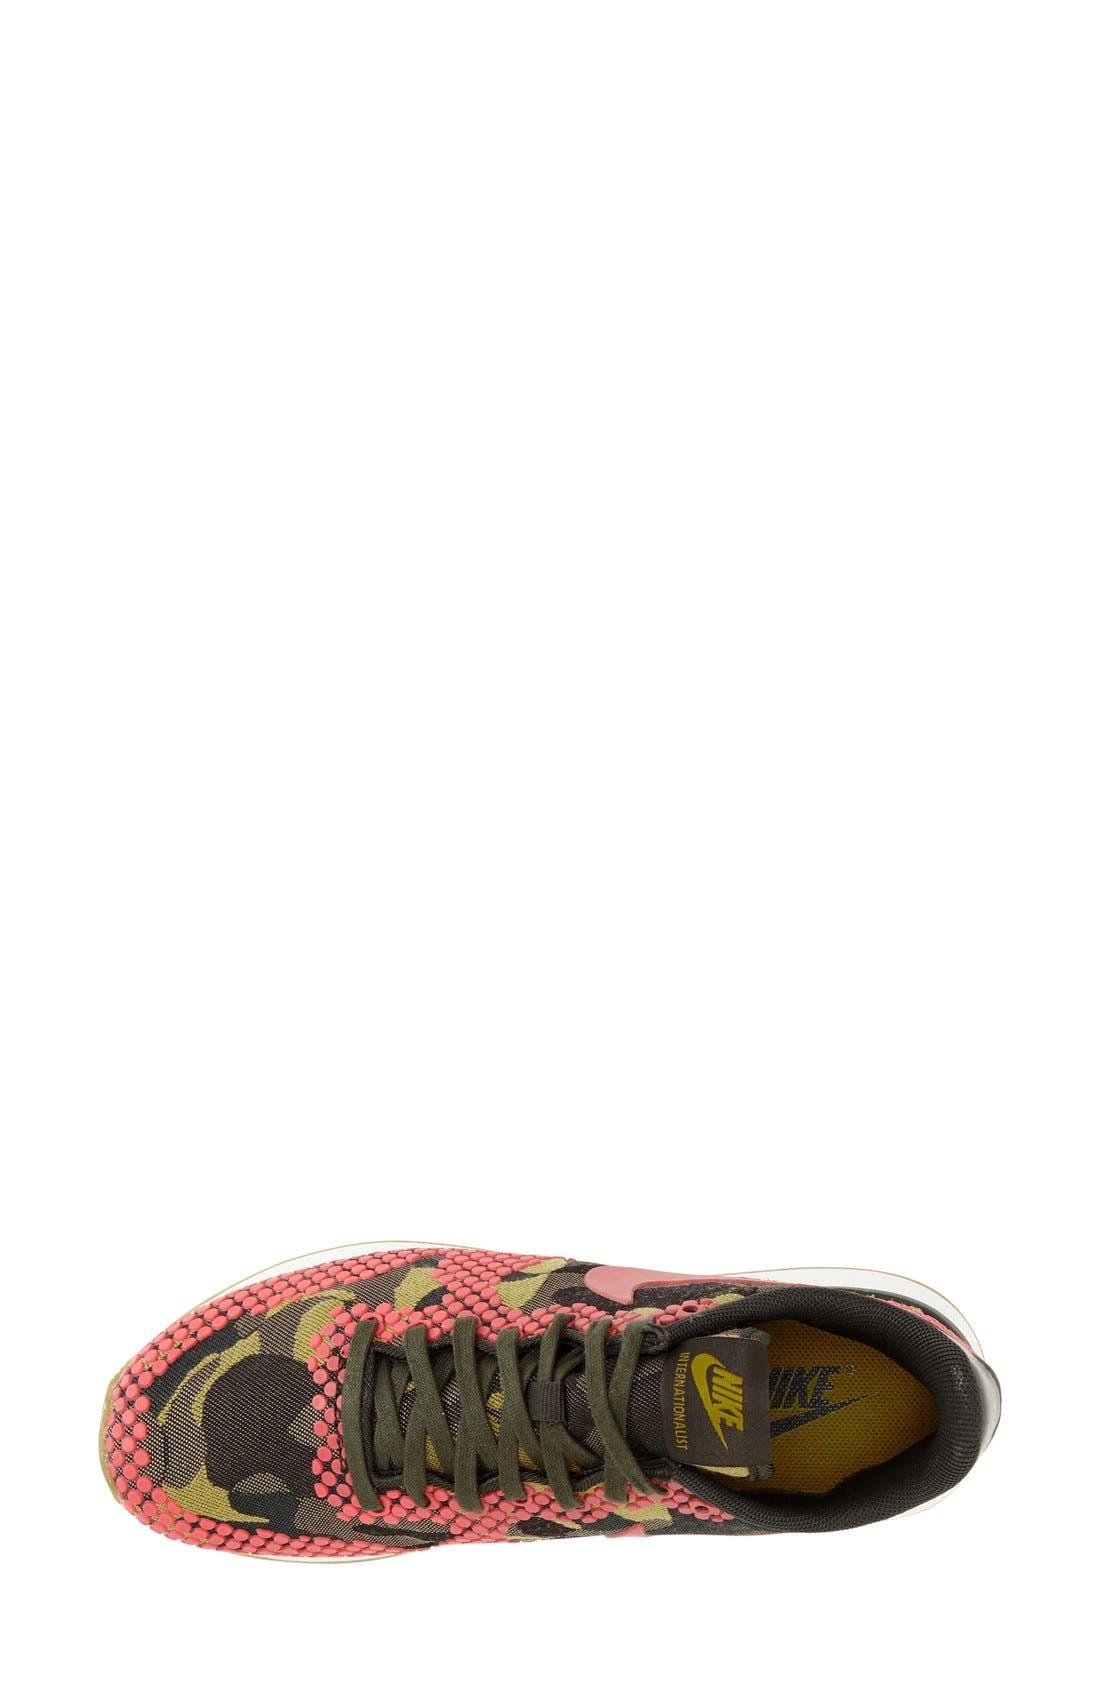 Alternate Image 3  - Nike 'Internationalist' Print Sneaker (Women)